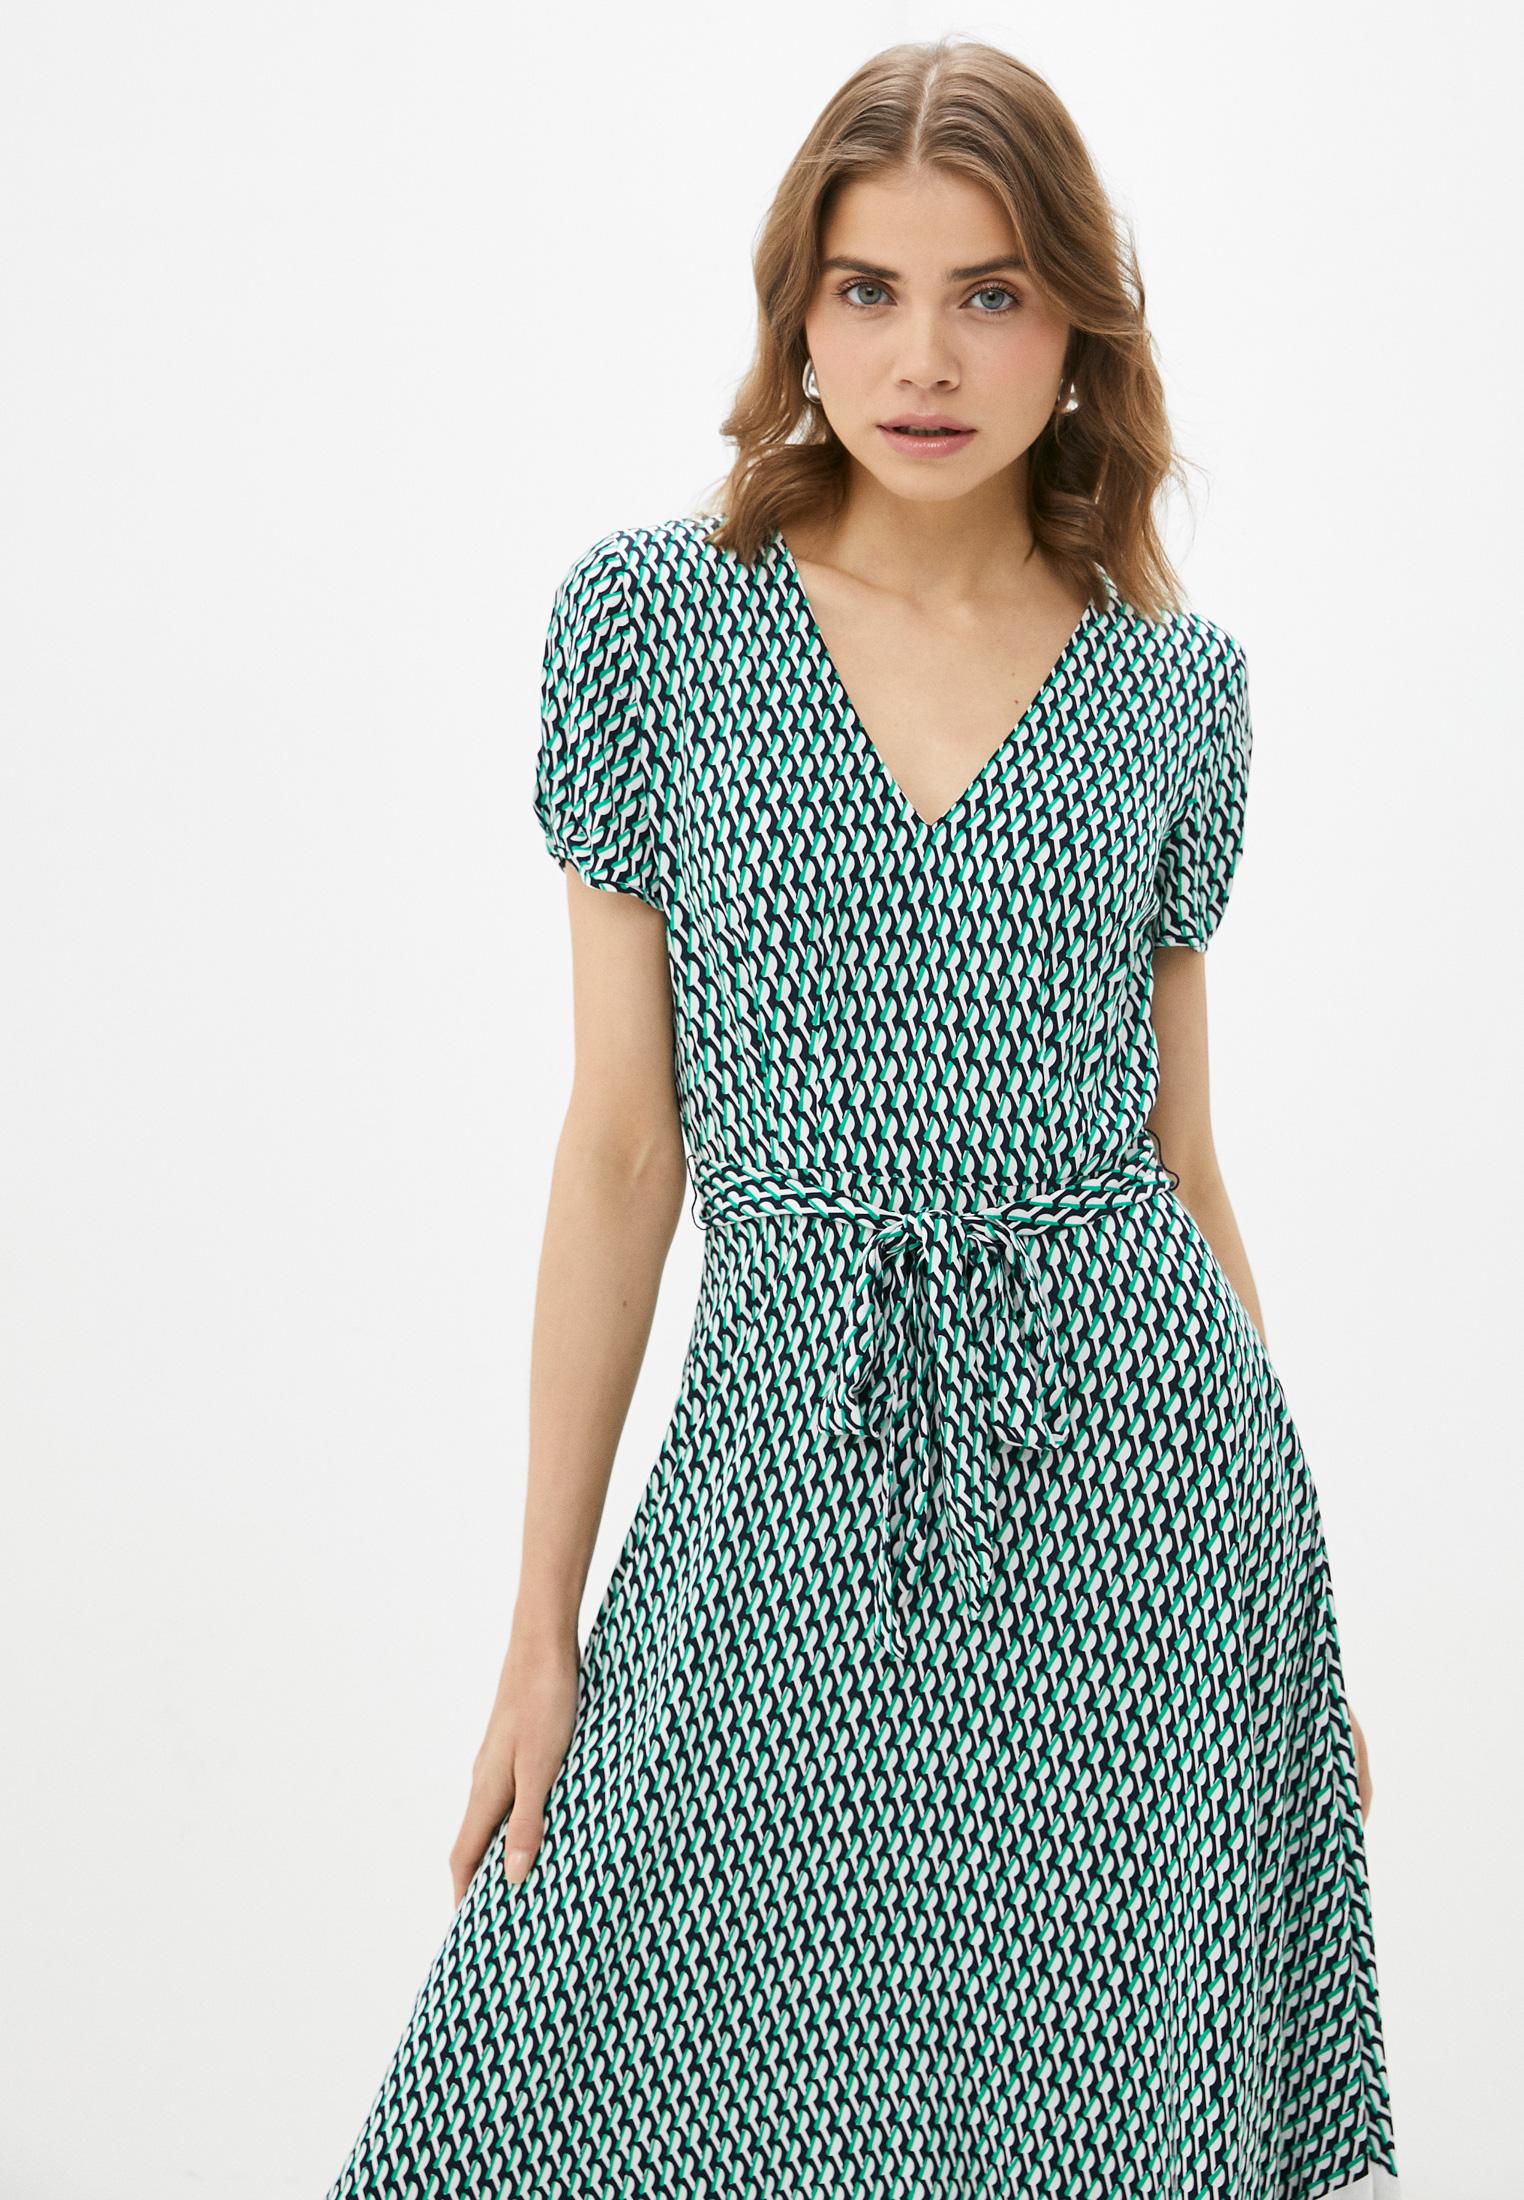 Платье Tommy Hilfiger (Томми Хилфигер) WW0WW30330: изображение 2